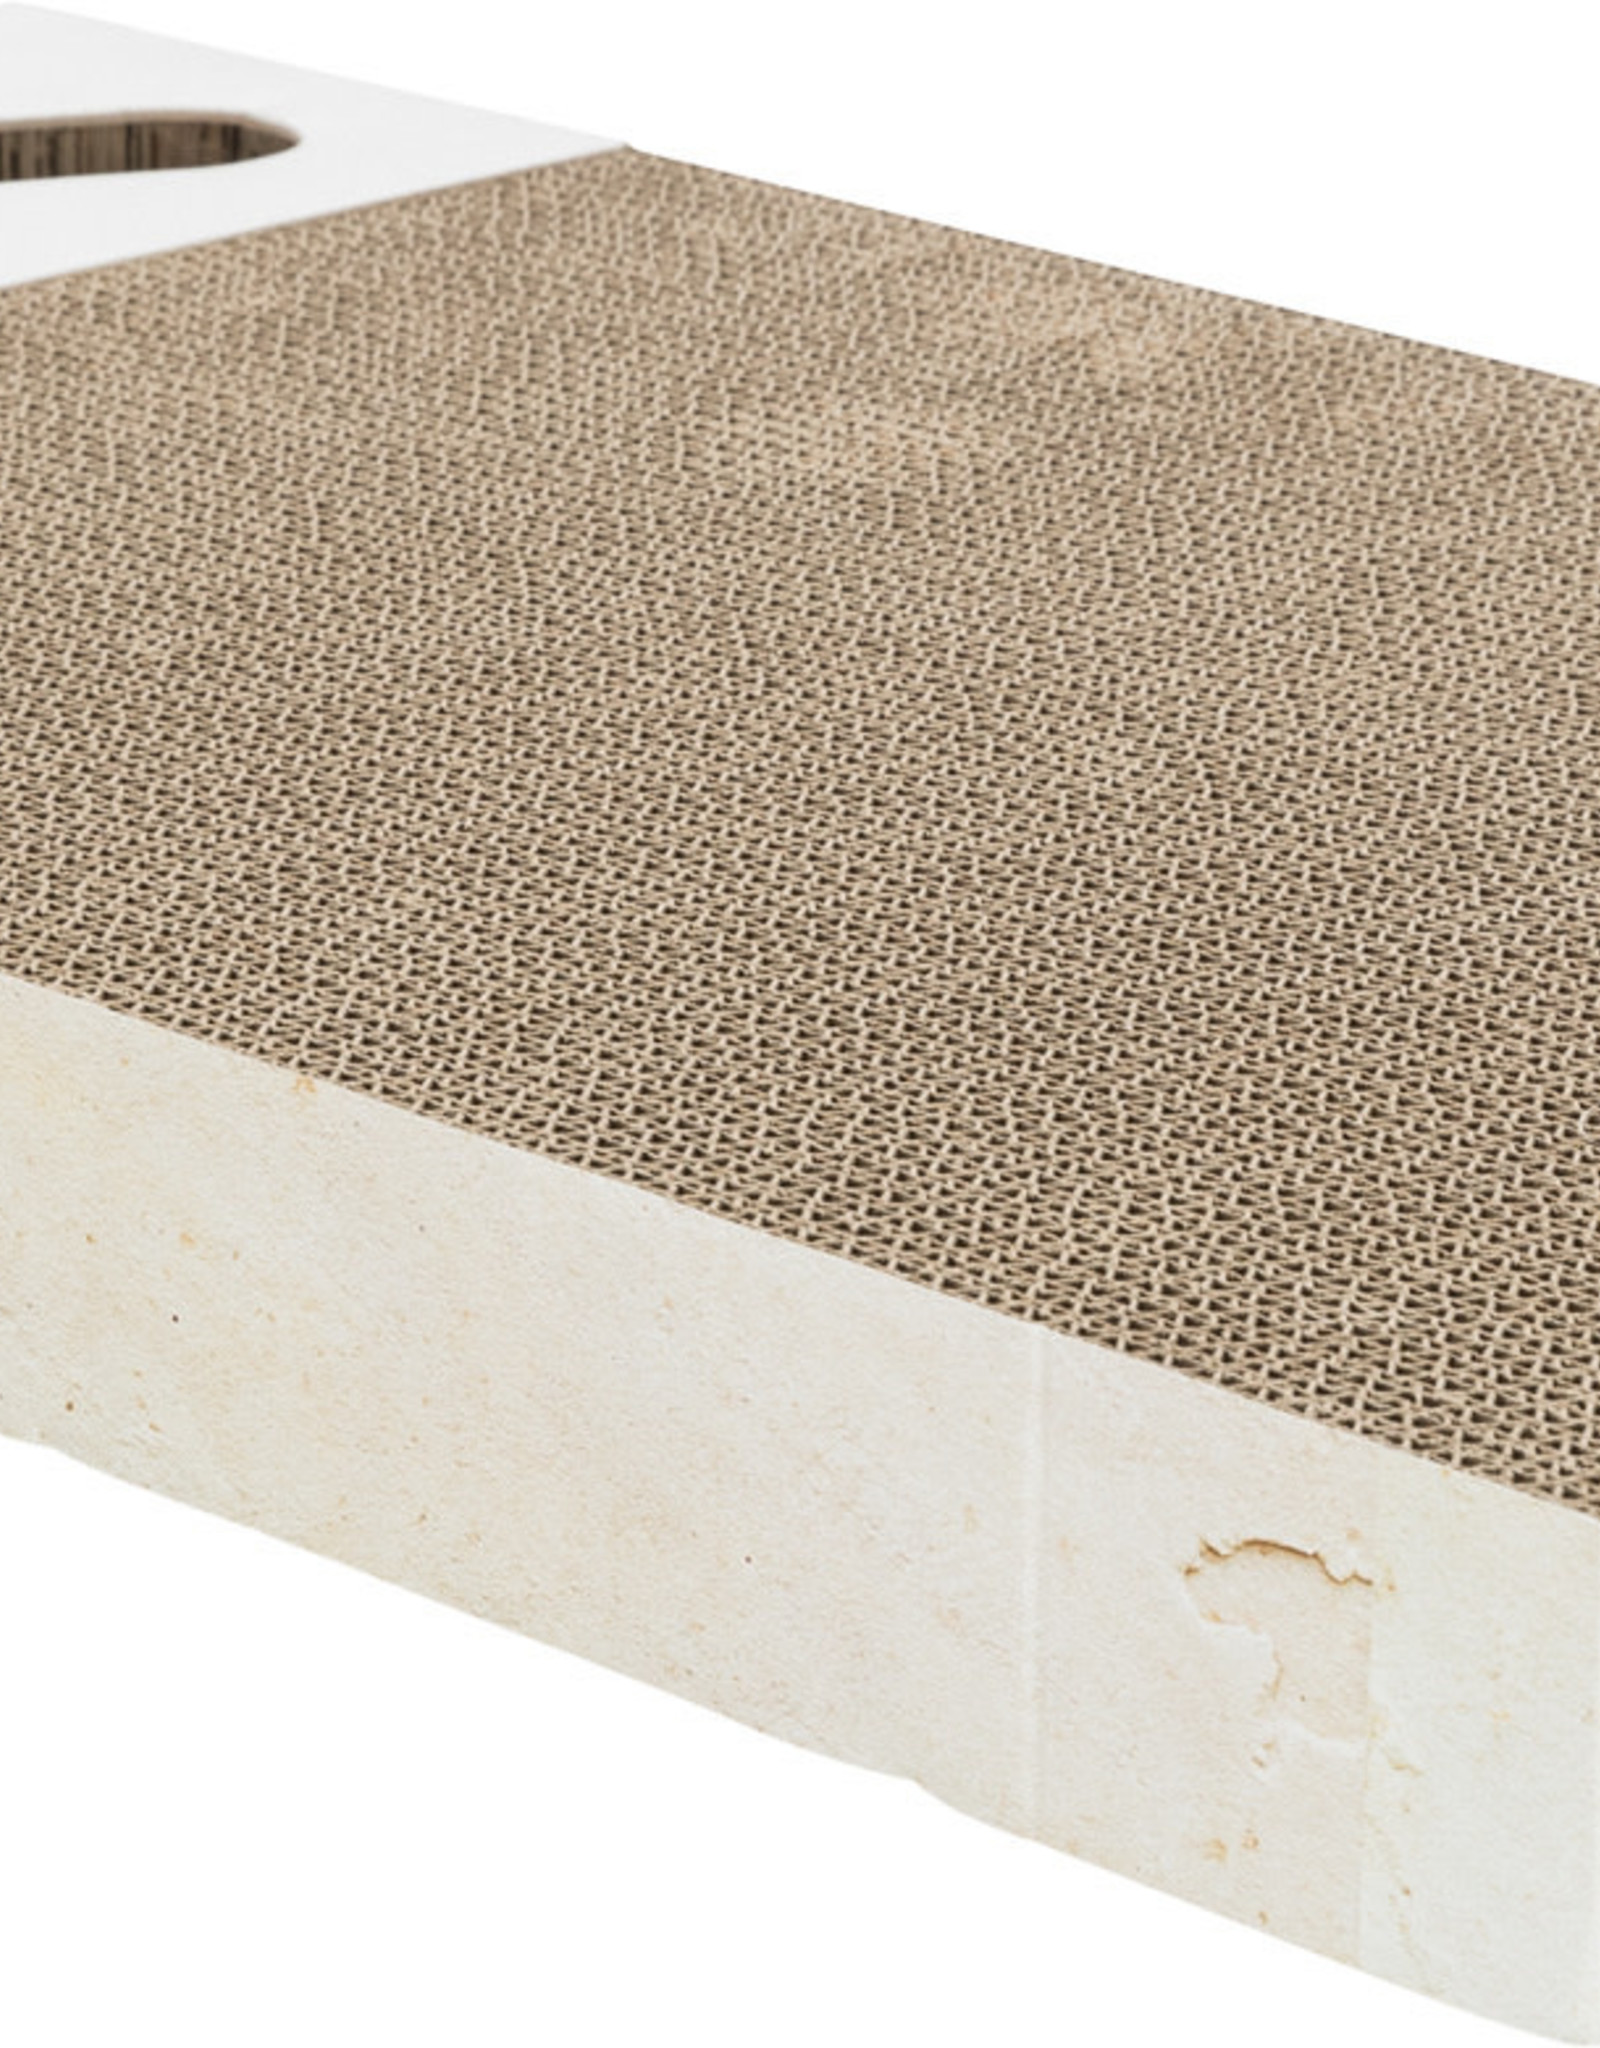 Trixie Cardboard Cat Scratching Post Flat 70x6x38cm